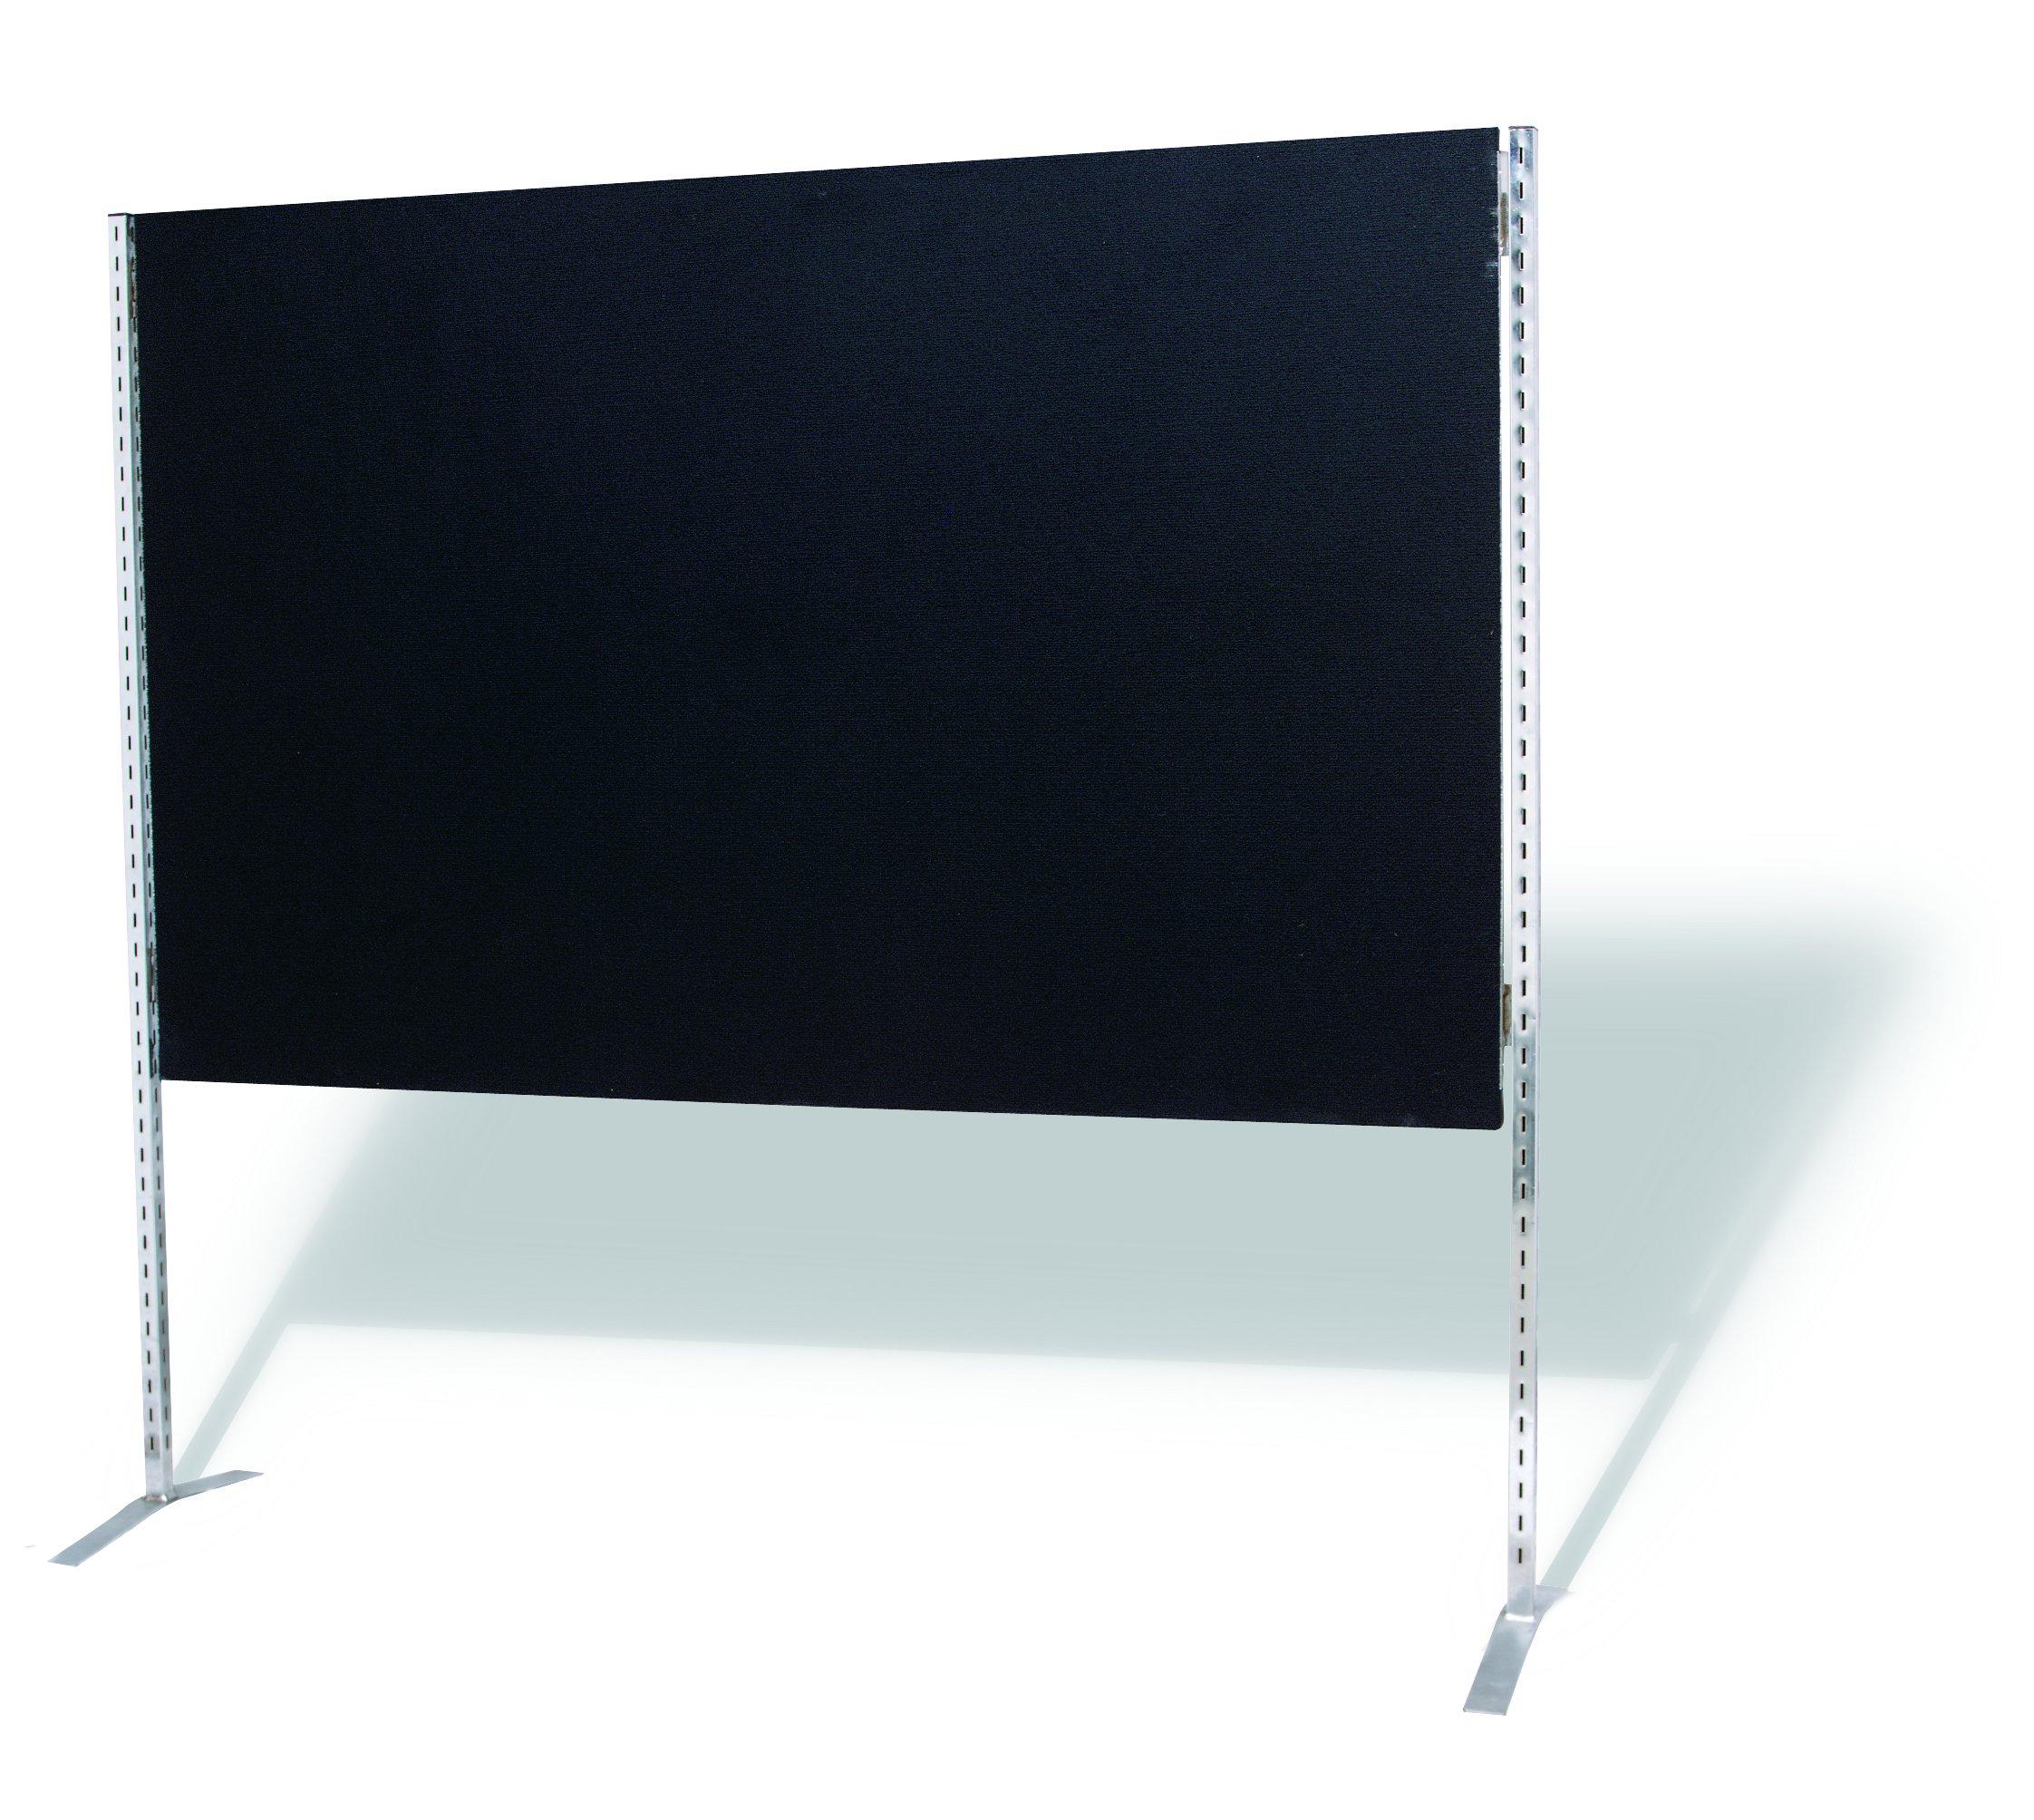 Display Screen Hori 1800L x 1200W